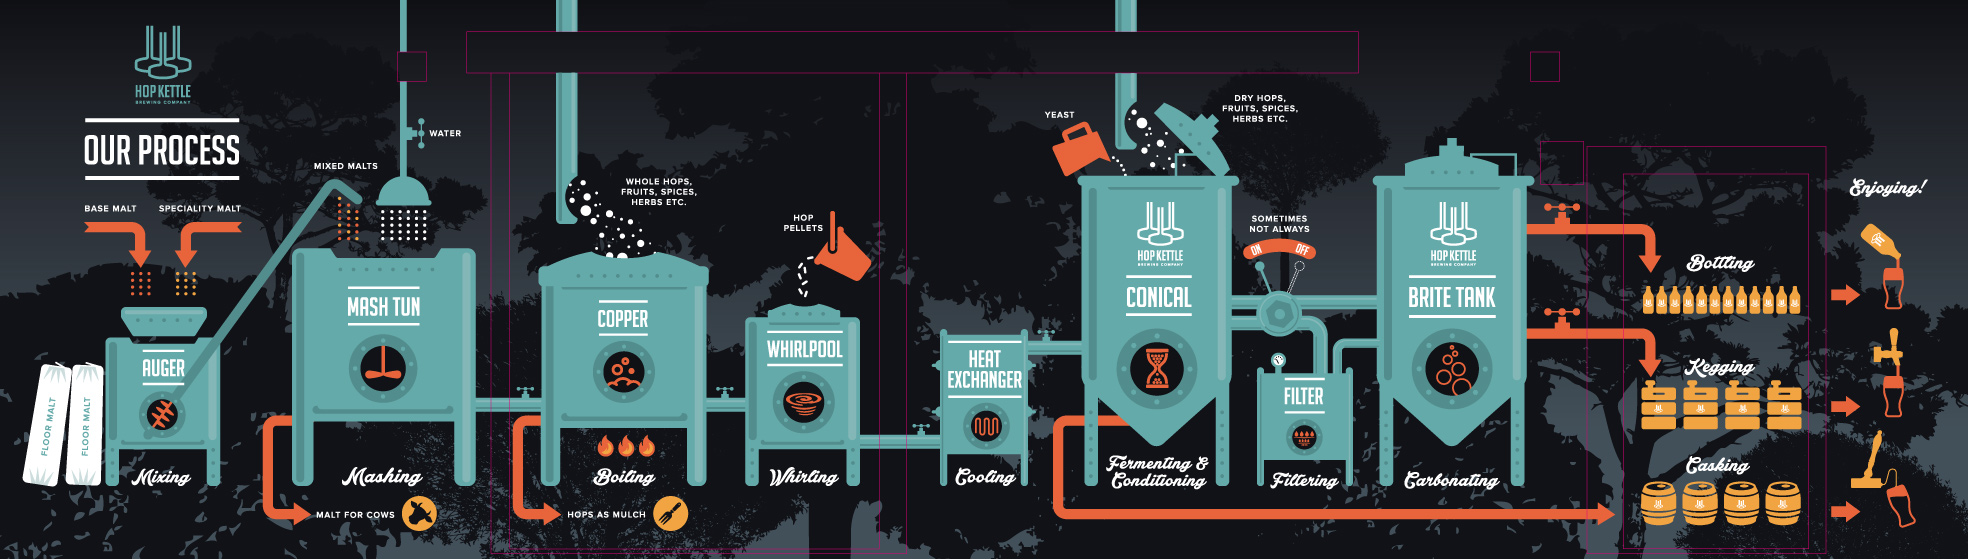 https://www.hop-kettle.com/media/Our-brewing-process.jpg